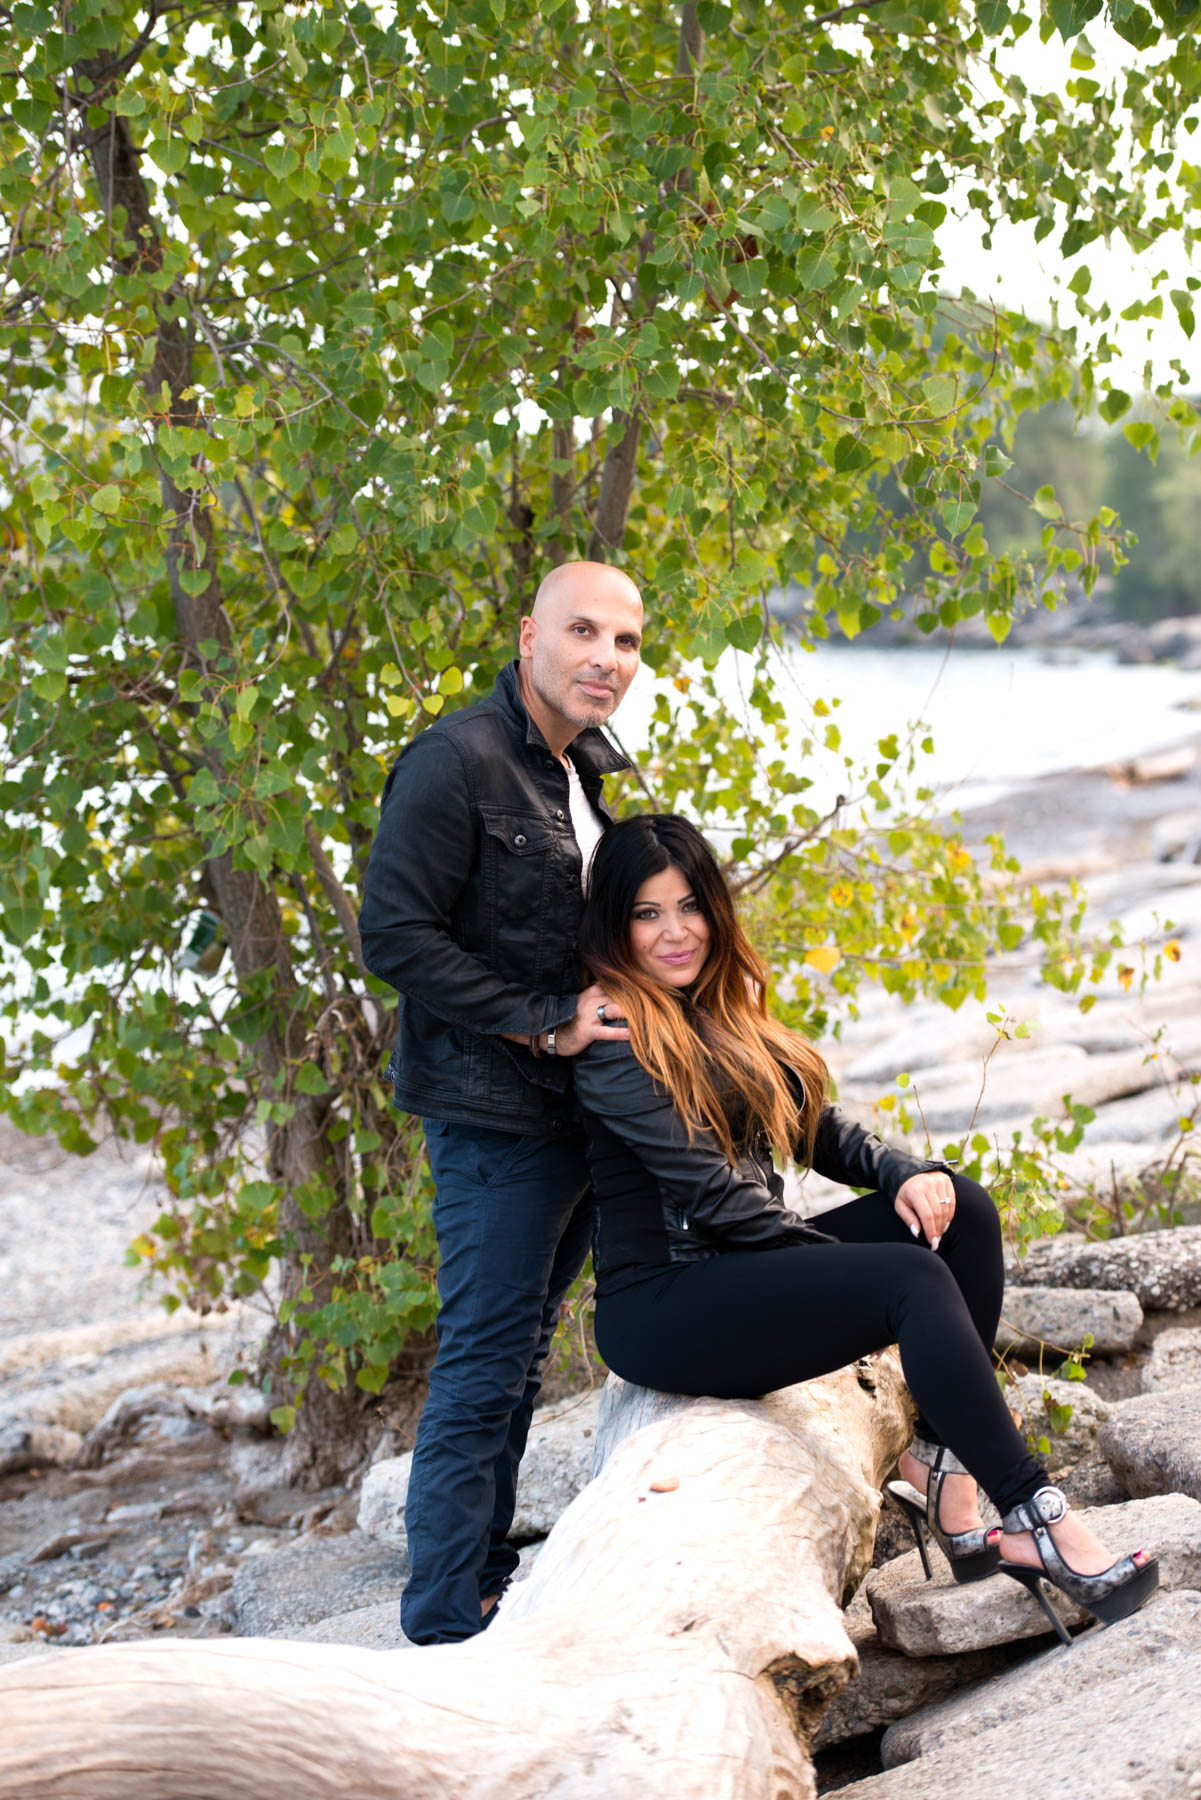 061 - Engagement FL Humber Bay Park - Toronto